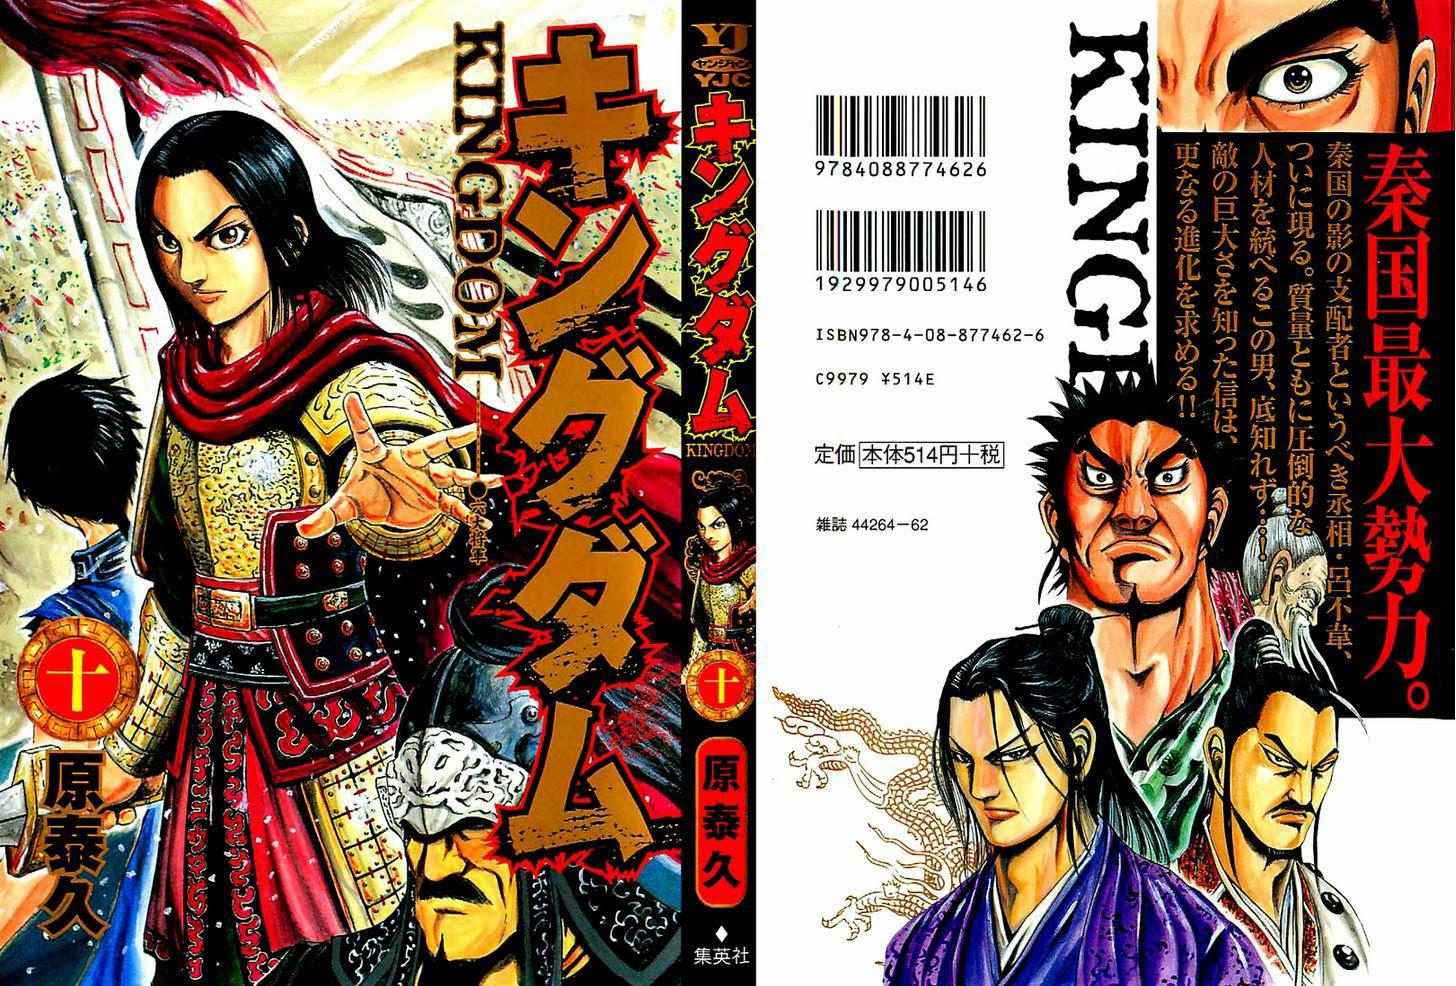 Kingdom Manga To be on Break Until August 6